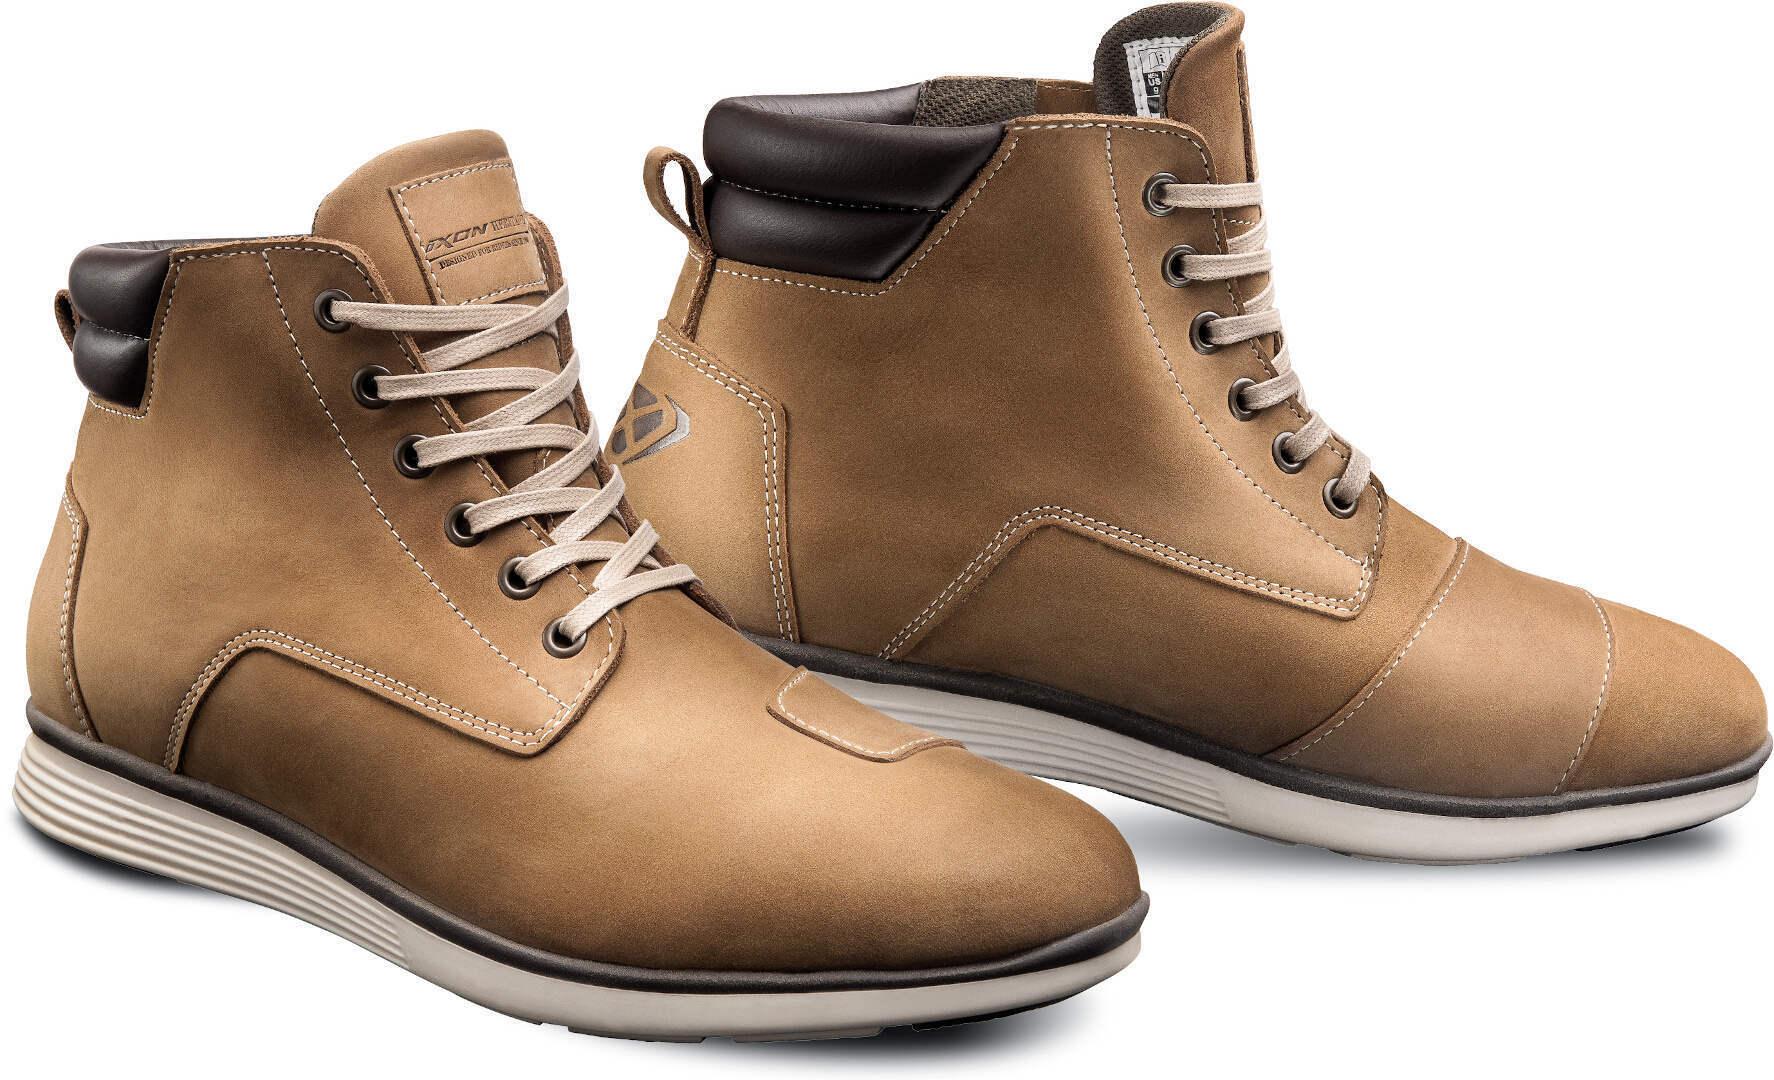 Ixon Akron Chaussures de moto Brun taille : 40